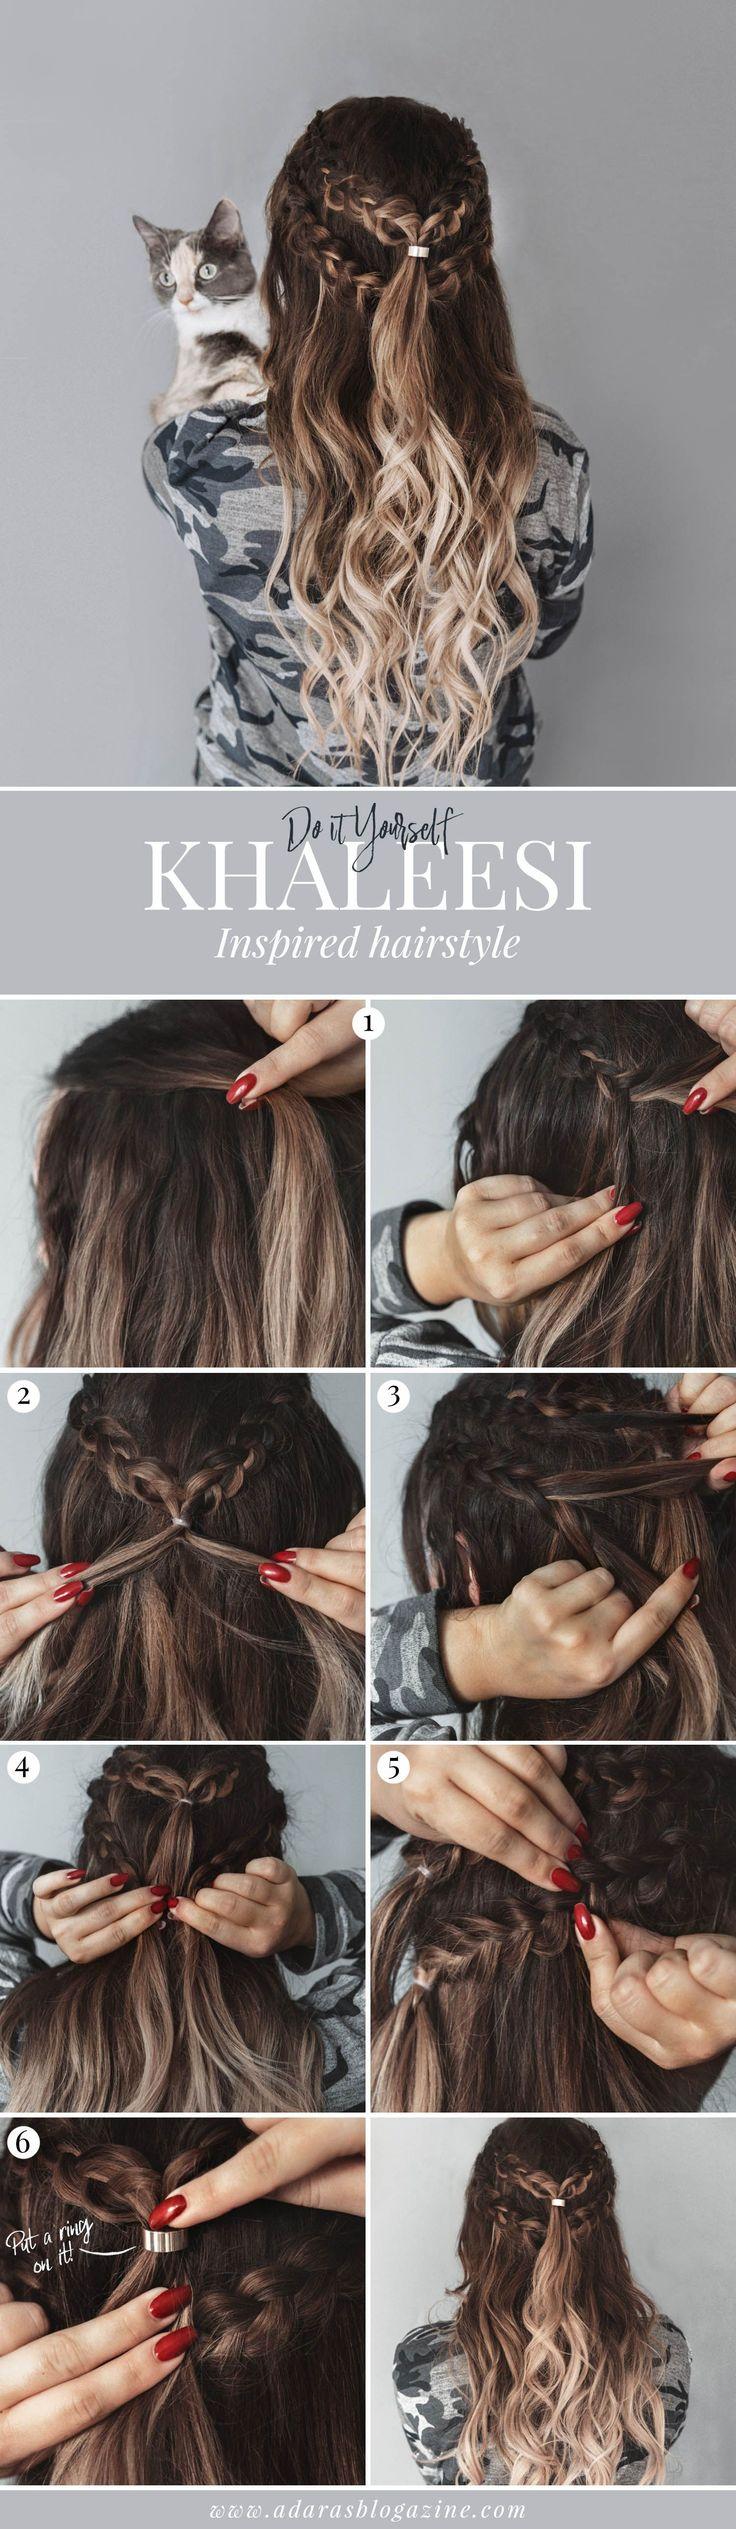 Tutorial: Khaleesi Hairstyle with Braids – in 6 Simple Steps – hair/make up